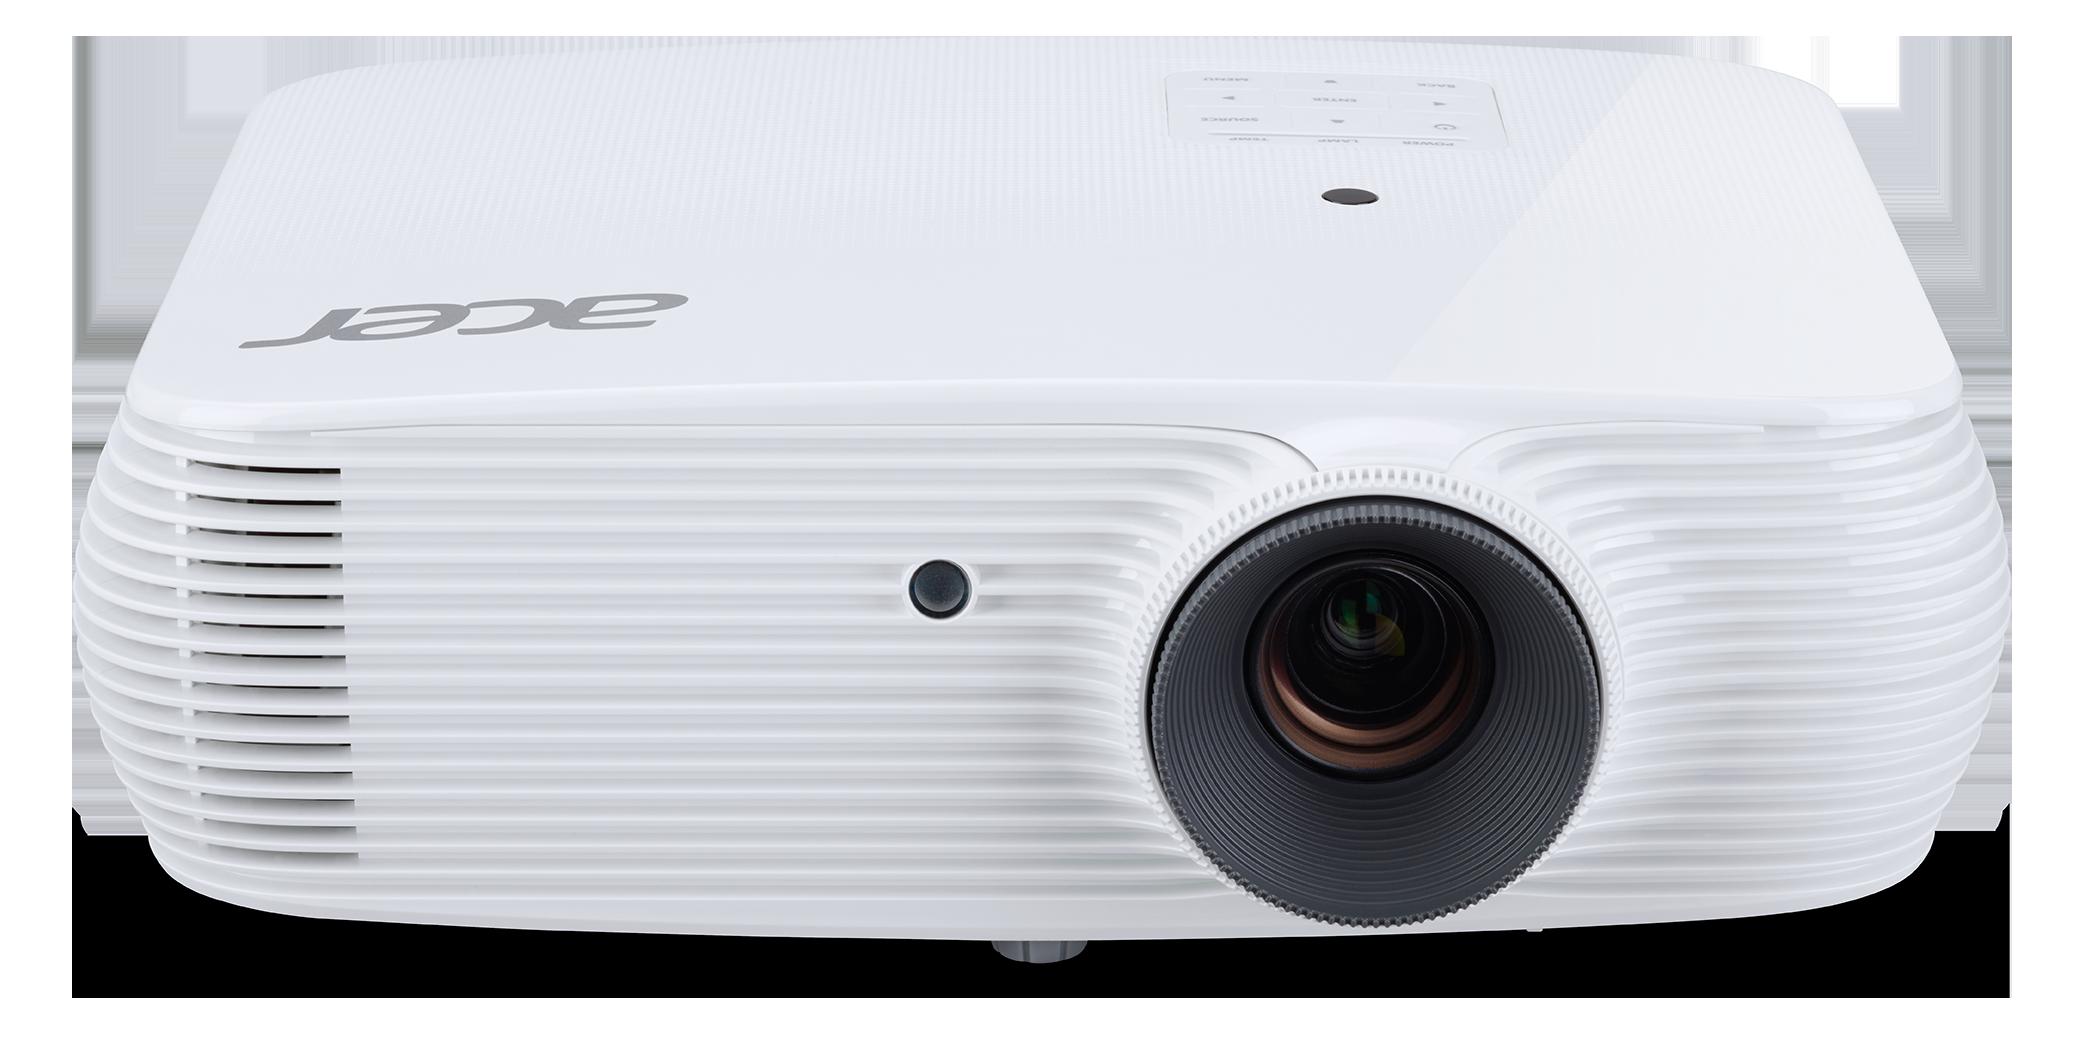 Acer H5382BD DLP/1280x720 720p/3300 ANSI lm/20 000:1/VGA/HDMI (MHL)/2.4Kg/ColorBoost 3D/ColorSafe II/NVIDIA&BluRay